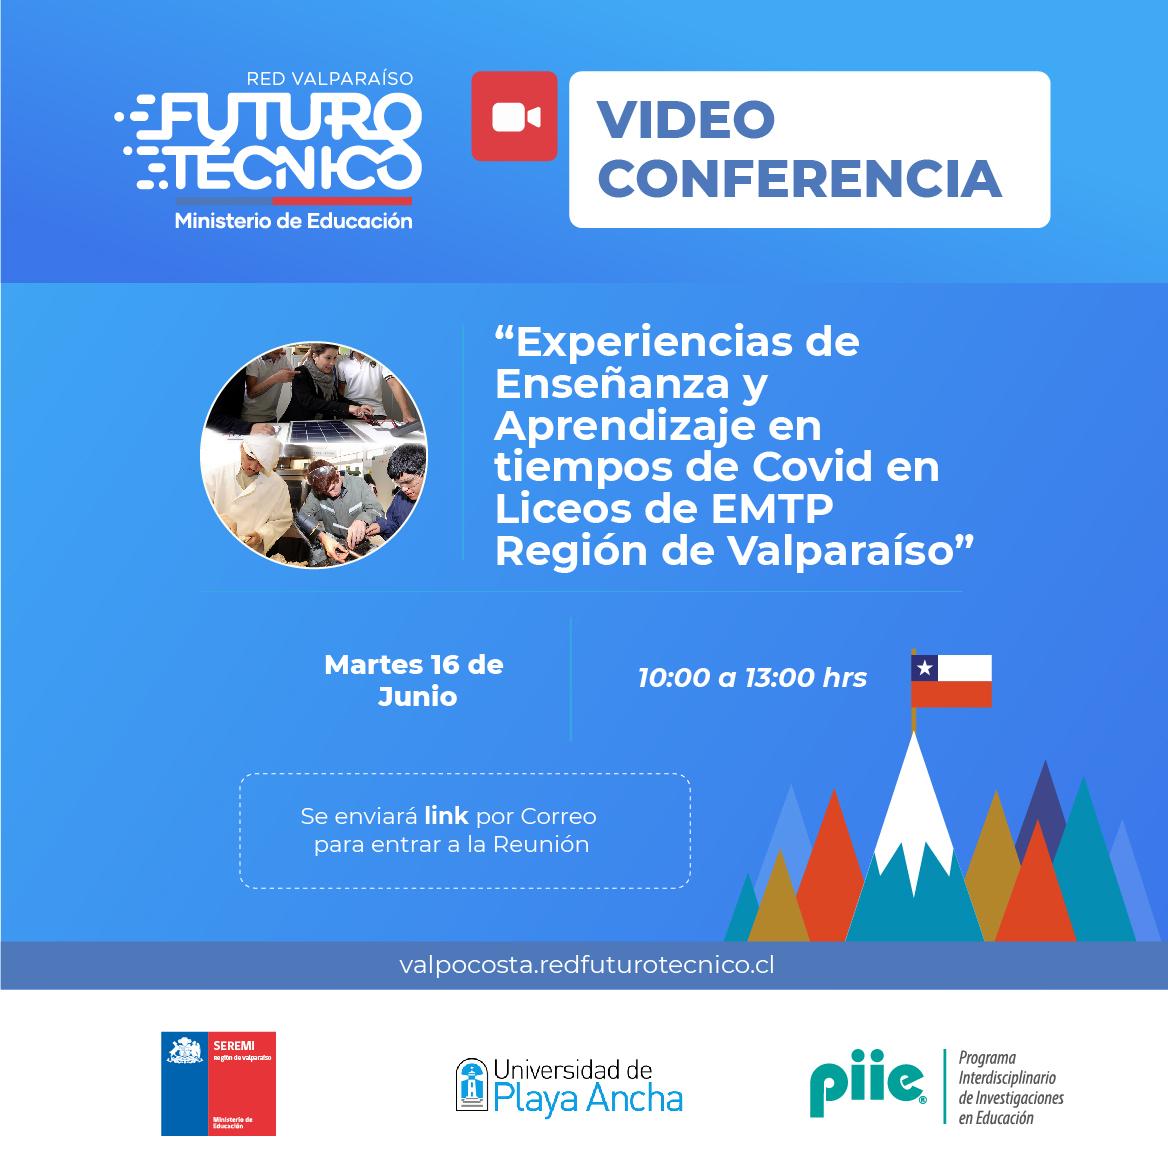 video conferencia 4